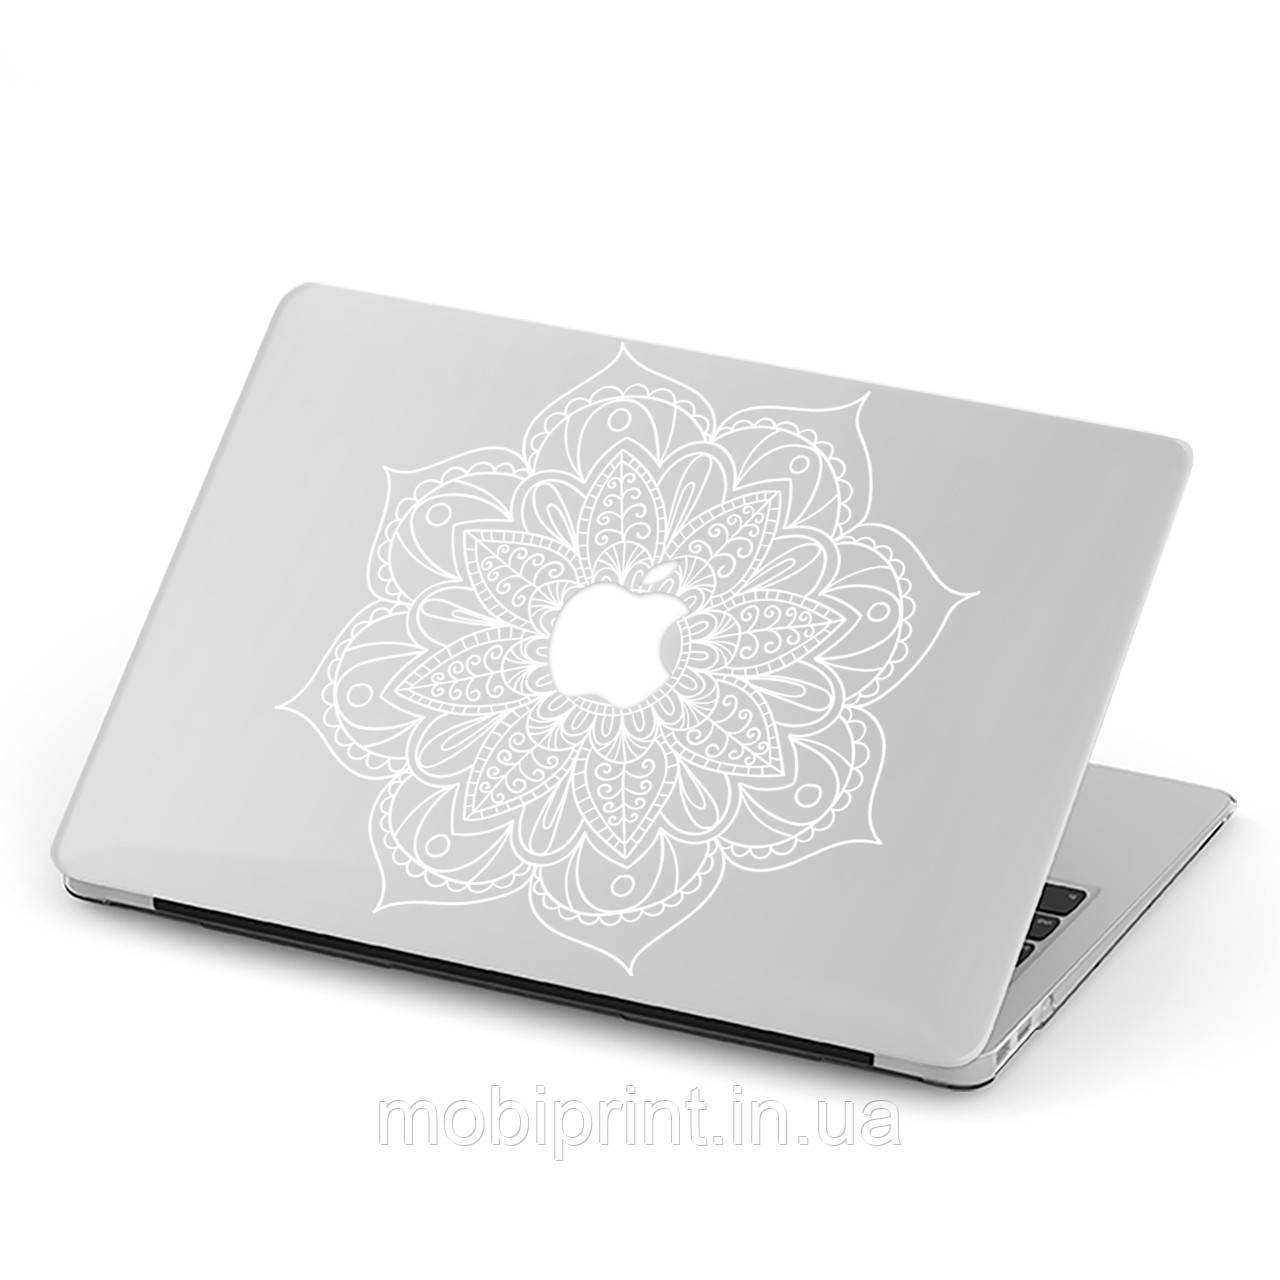 Пластиковий чохол для Apple MacBook Pro / Air Мандала (Mandala) макбук про hard case cover